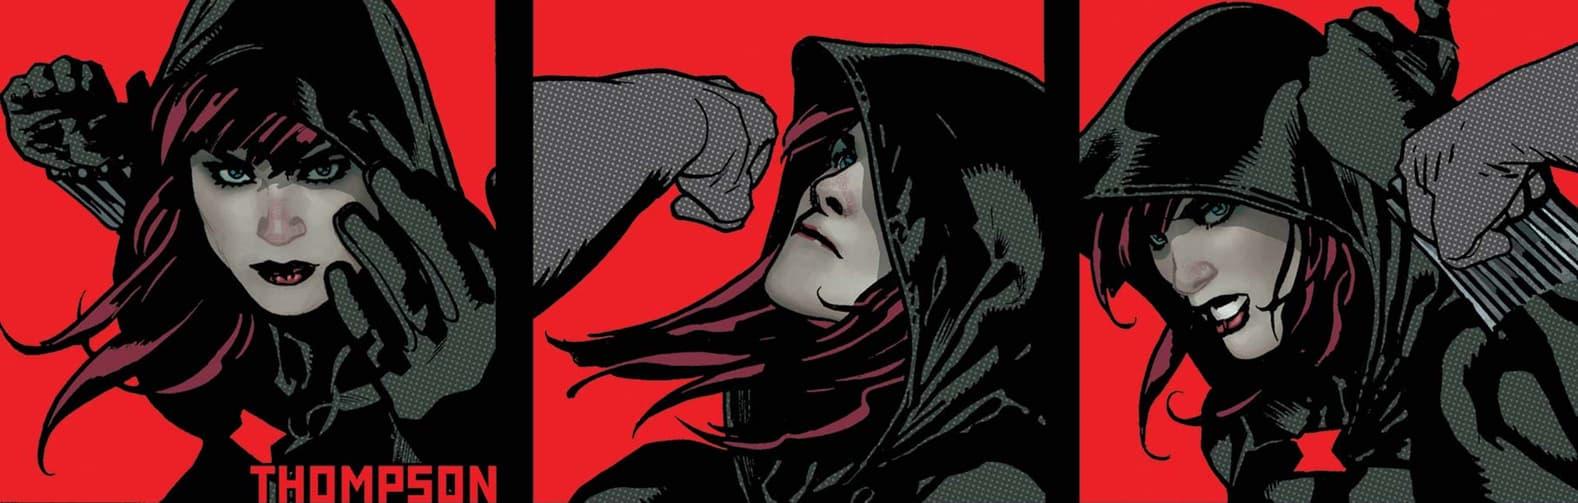 BLACK WIDOW (2020) #7 cover by Adam Hughes